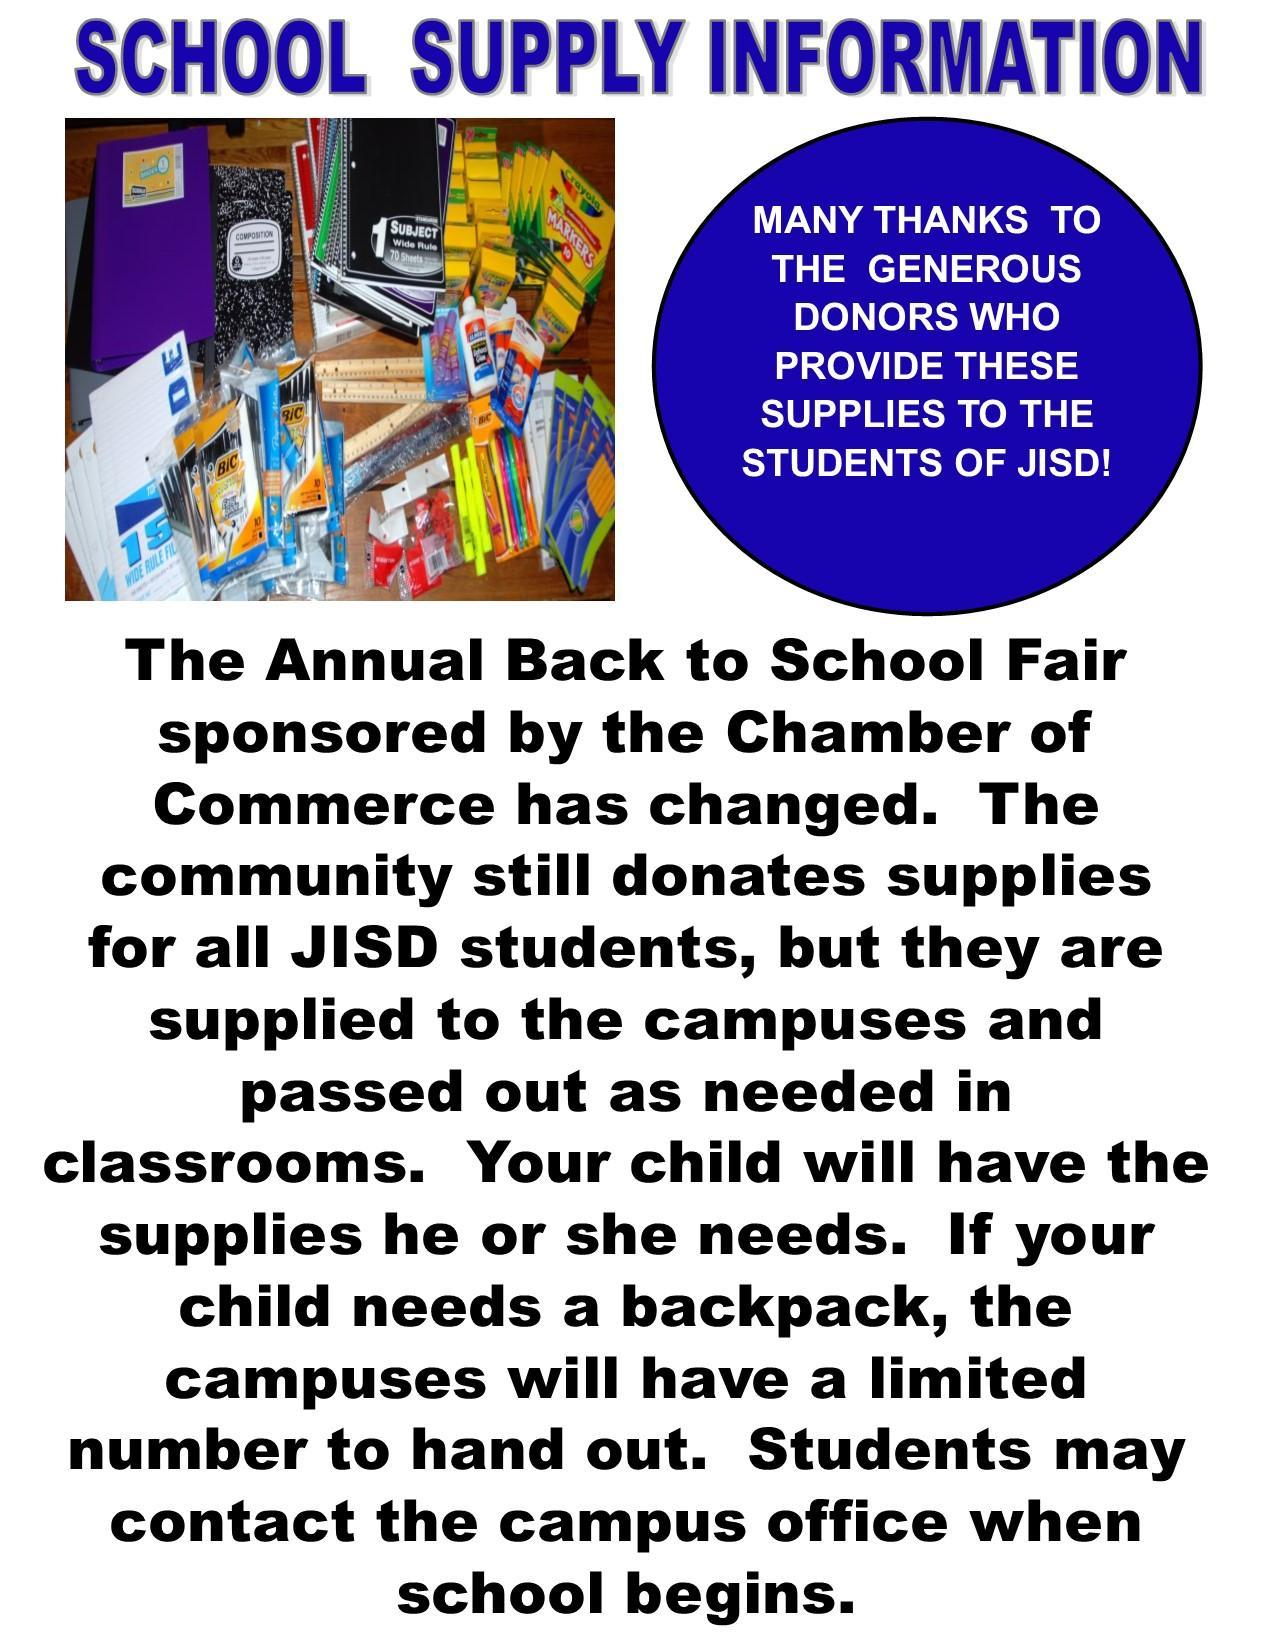 school supply delivery information